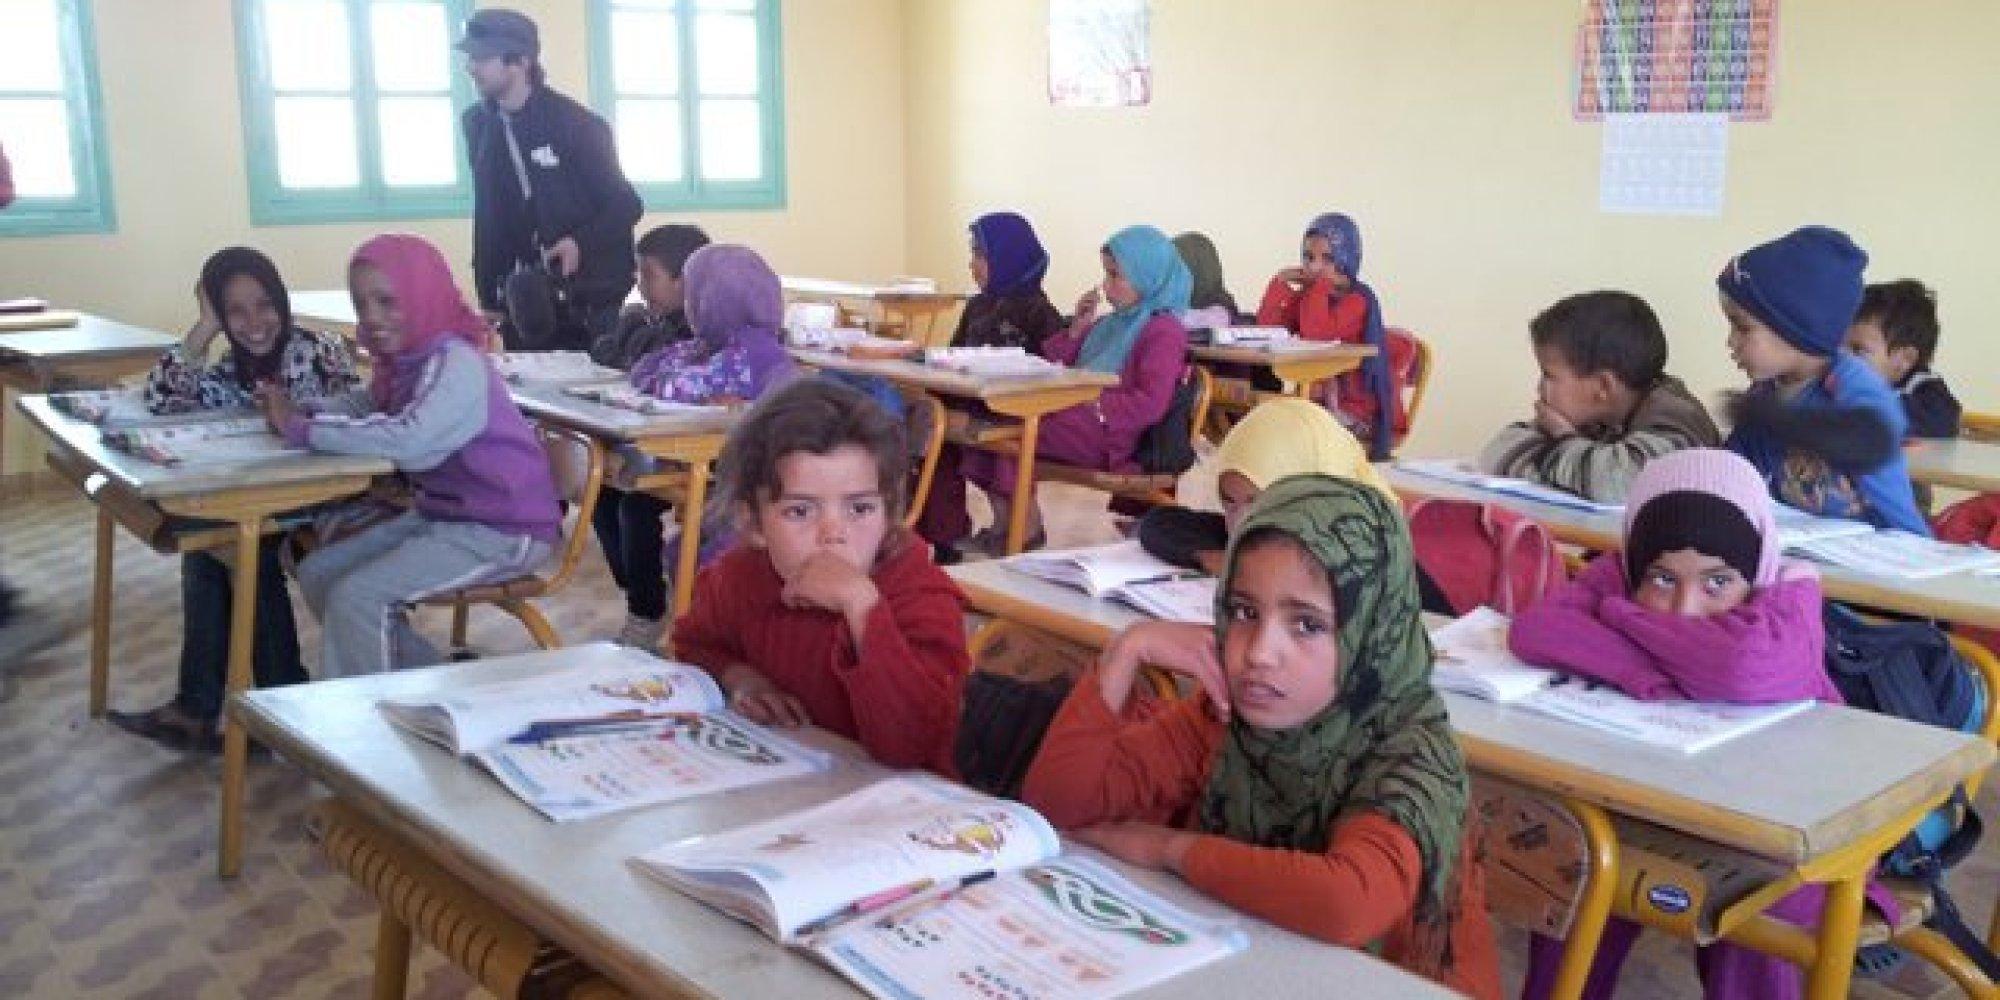 Education islamique le maroc veut r viser les programmes for Educacion exterior marruecos